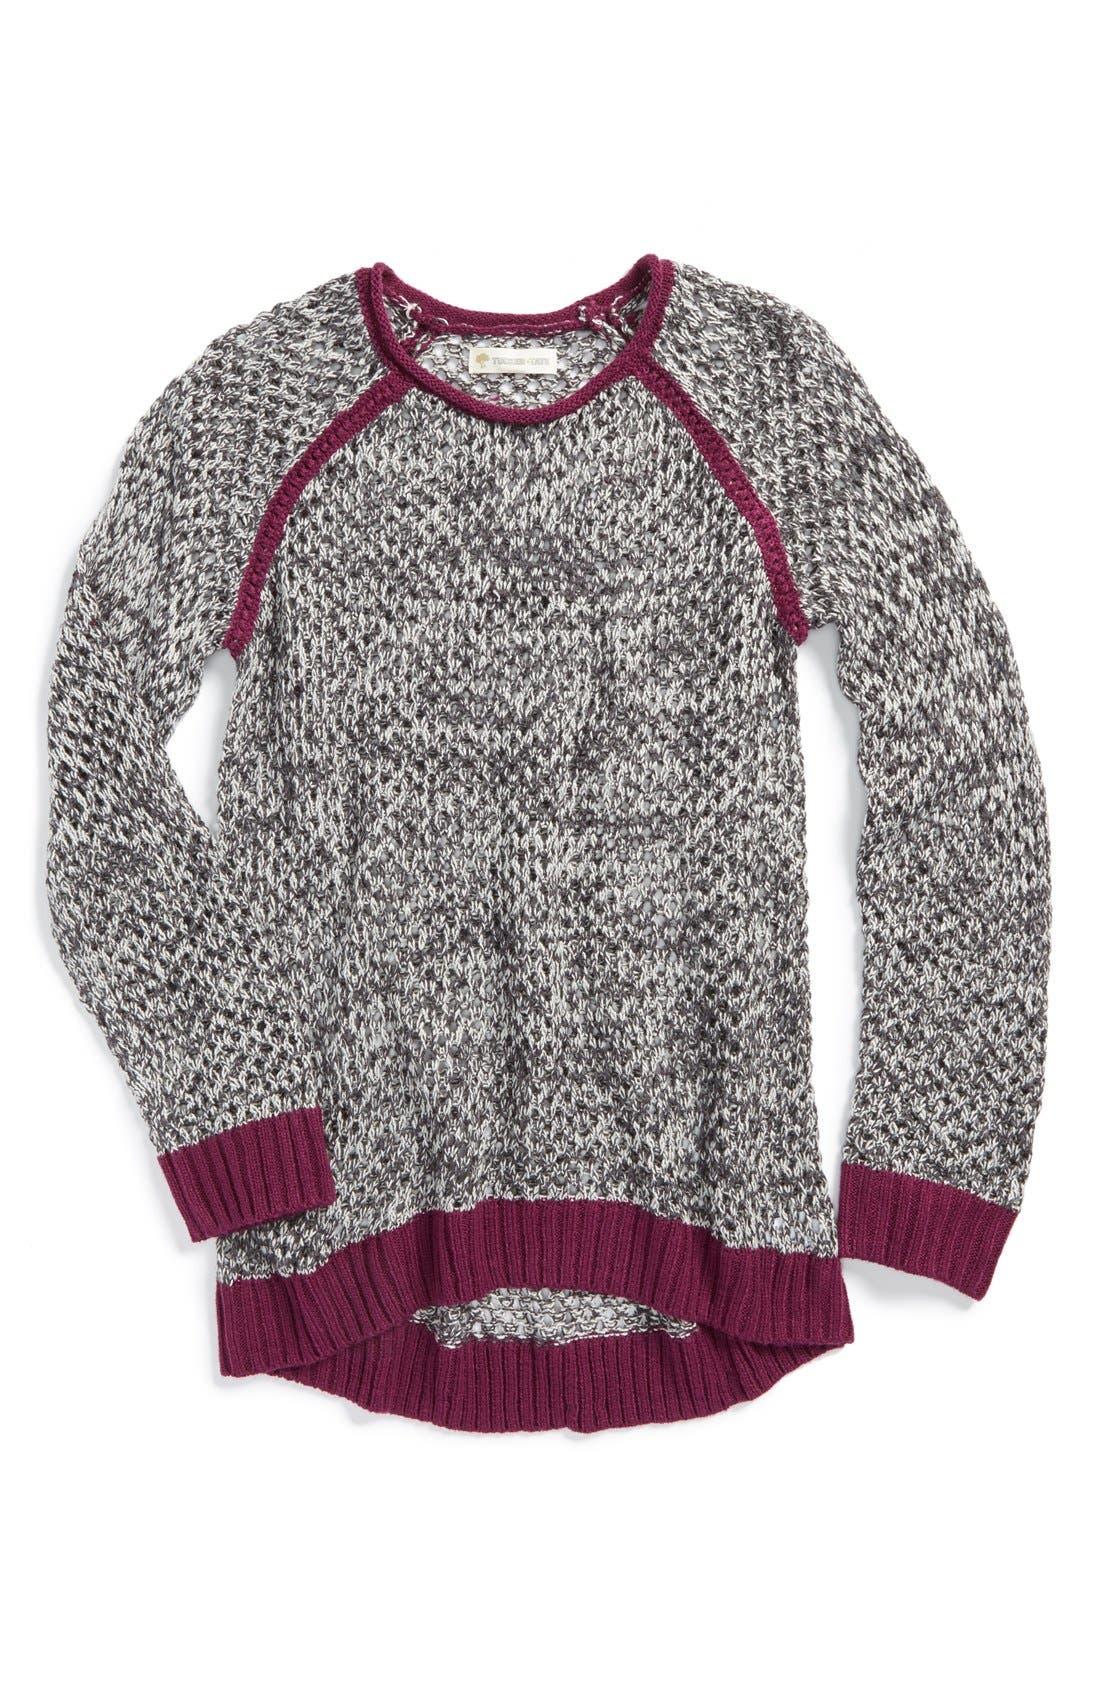 Main Image - Tucker + Tate 'Lucia' Raglan Sleeve Sweater (Big Girls)